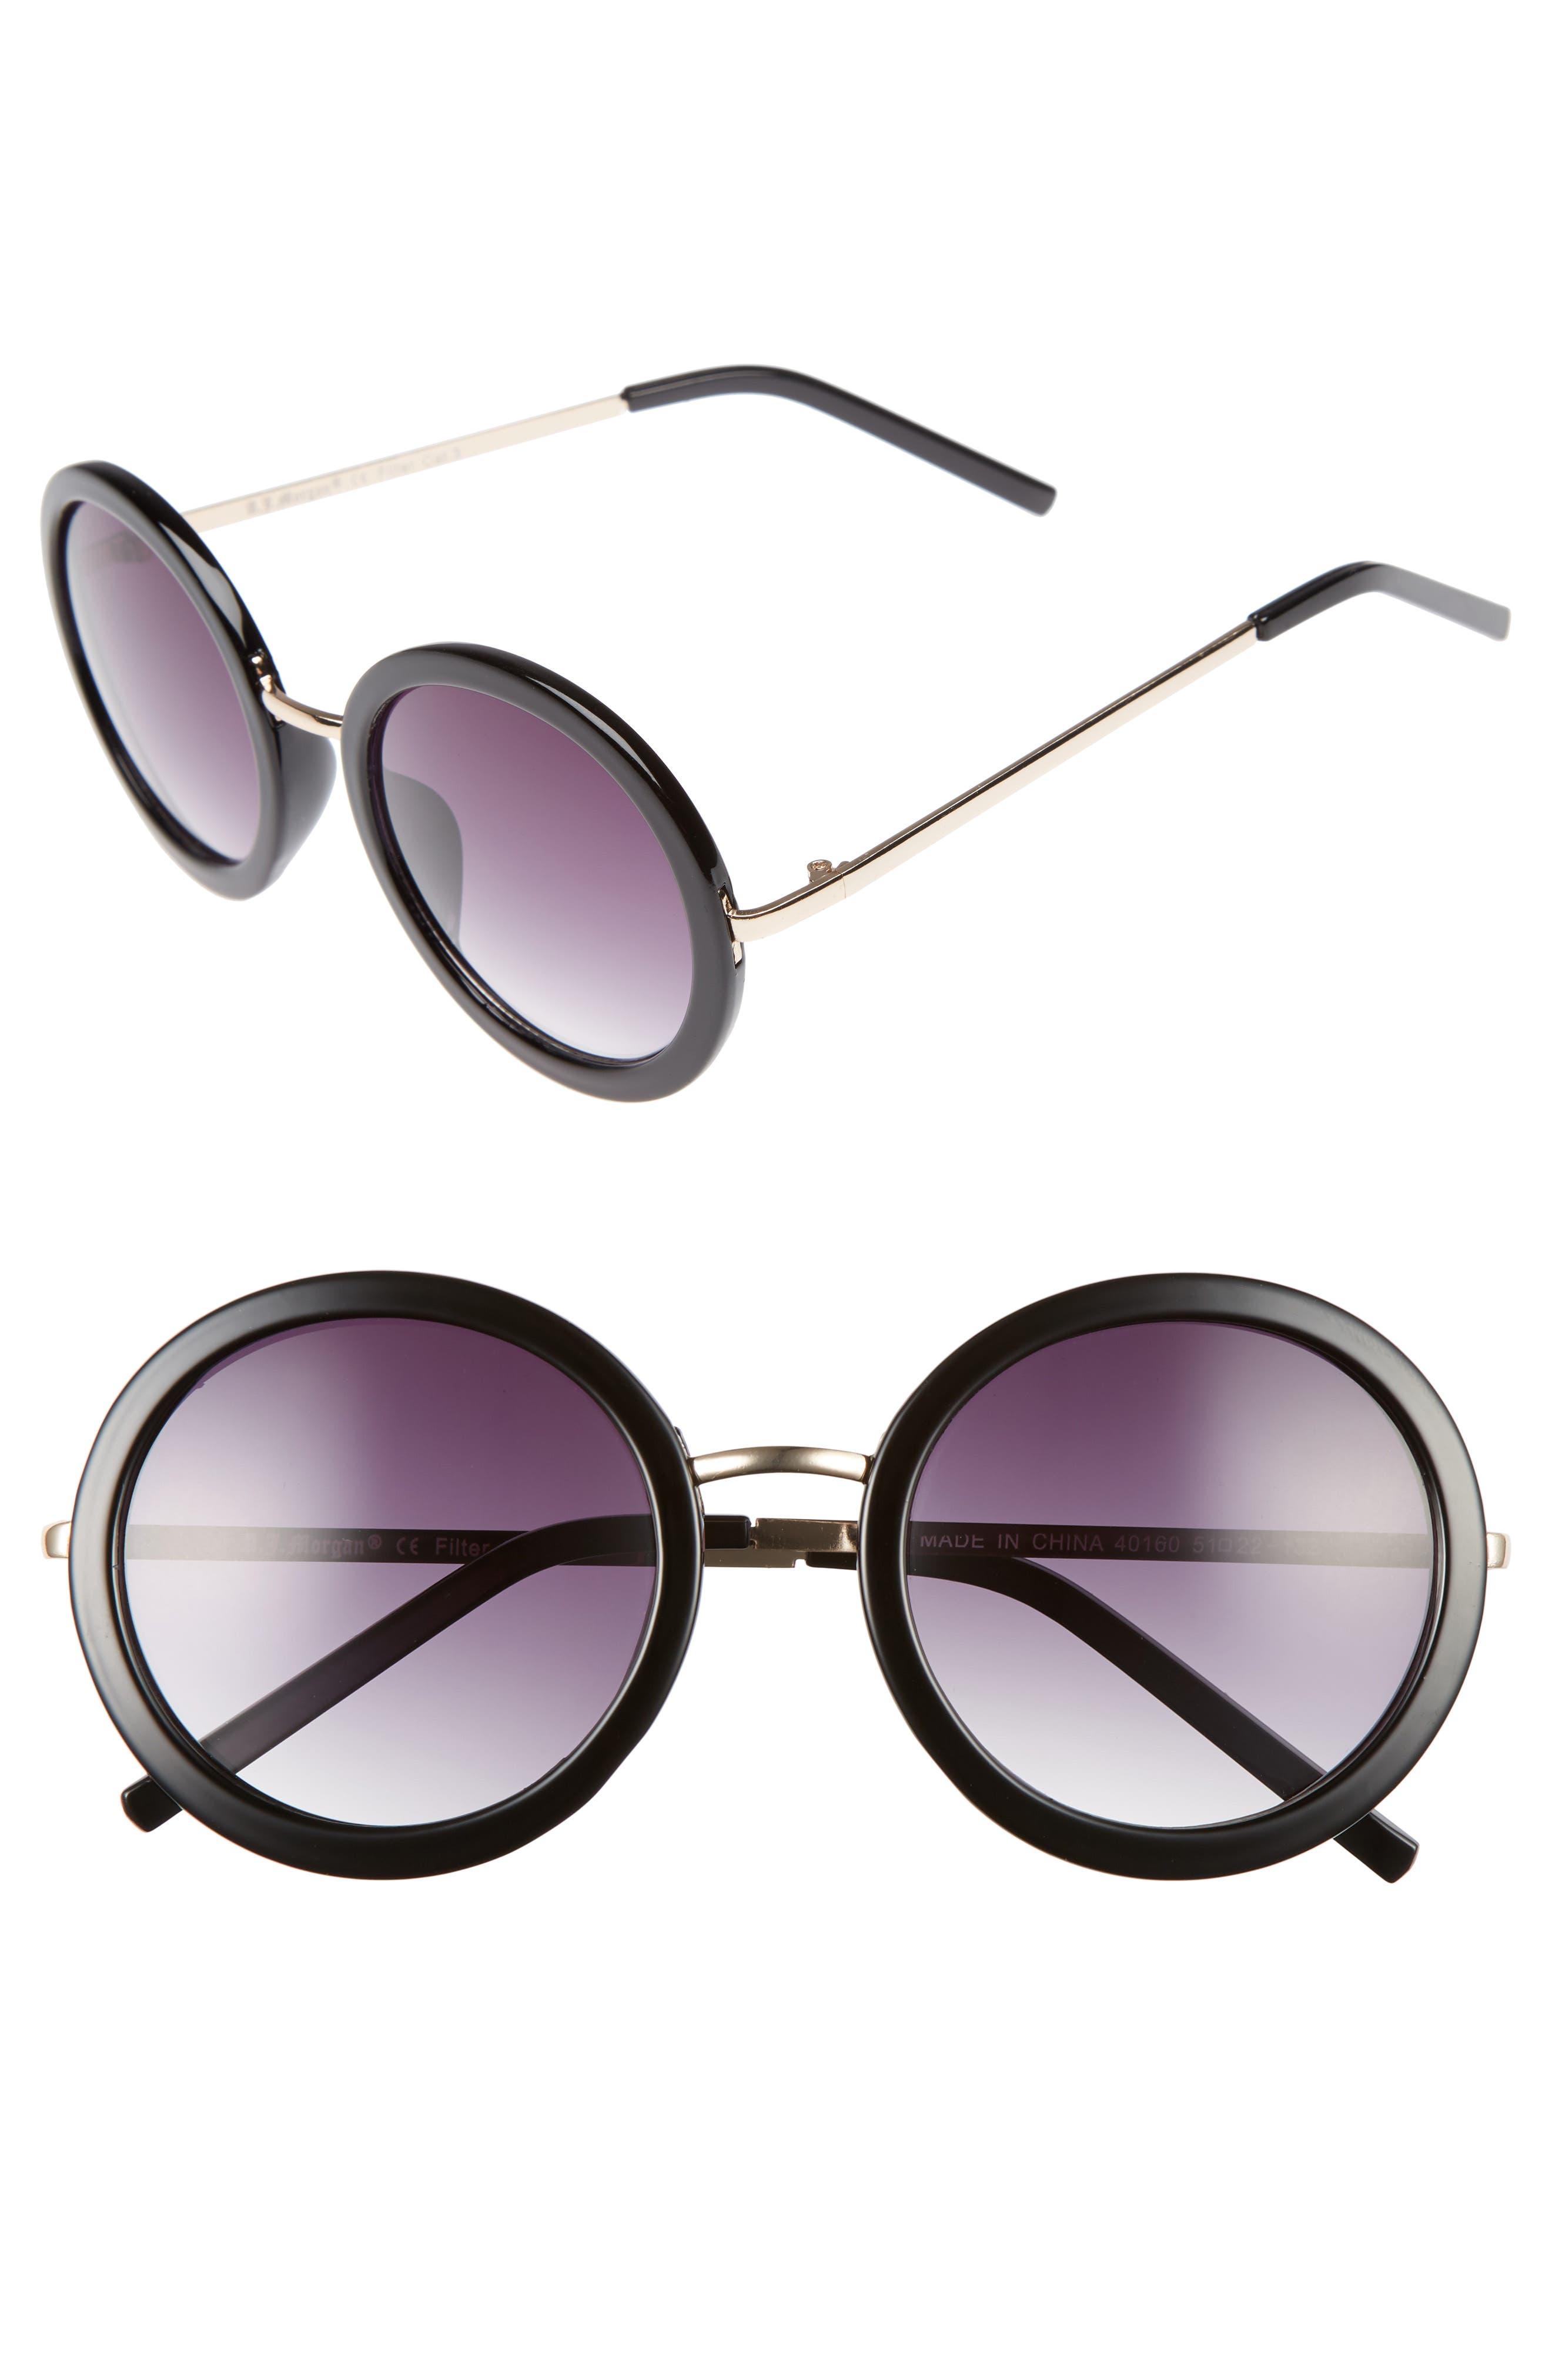 A.J. MORGAN 51mm Round Sunglasses, Main, color, 001